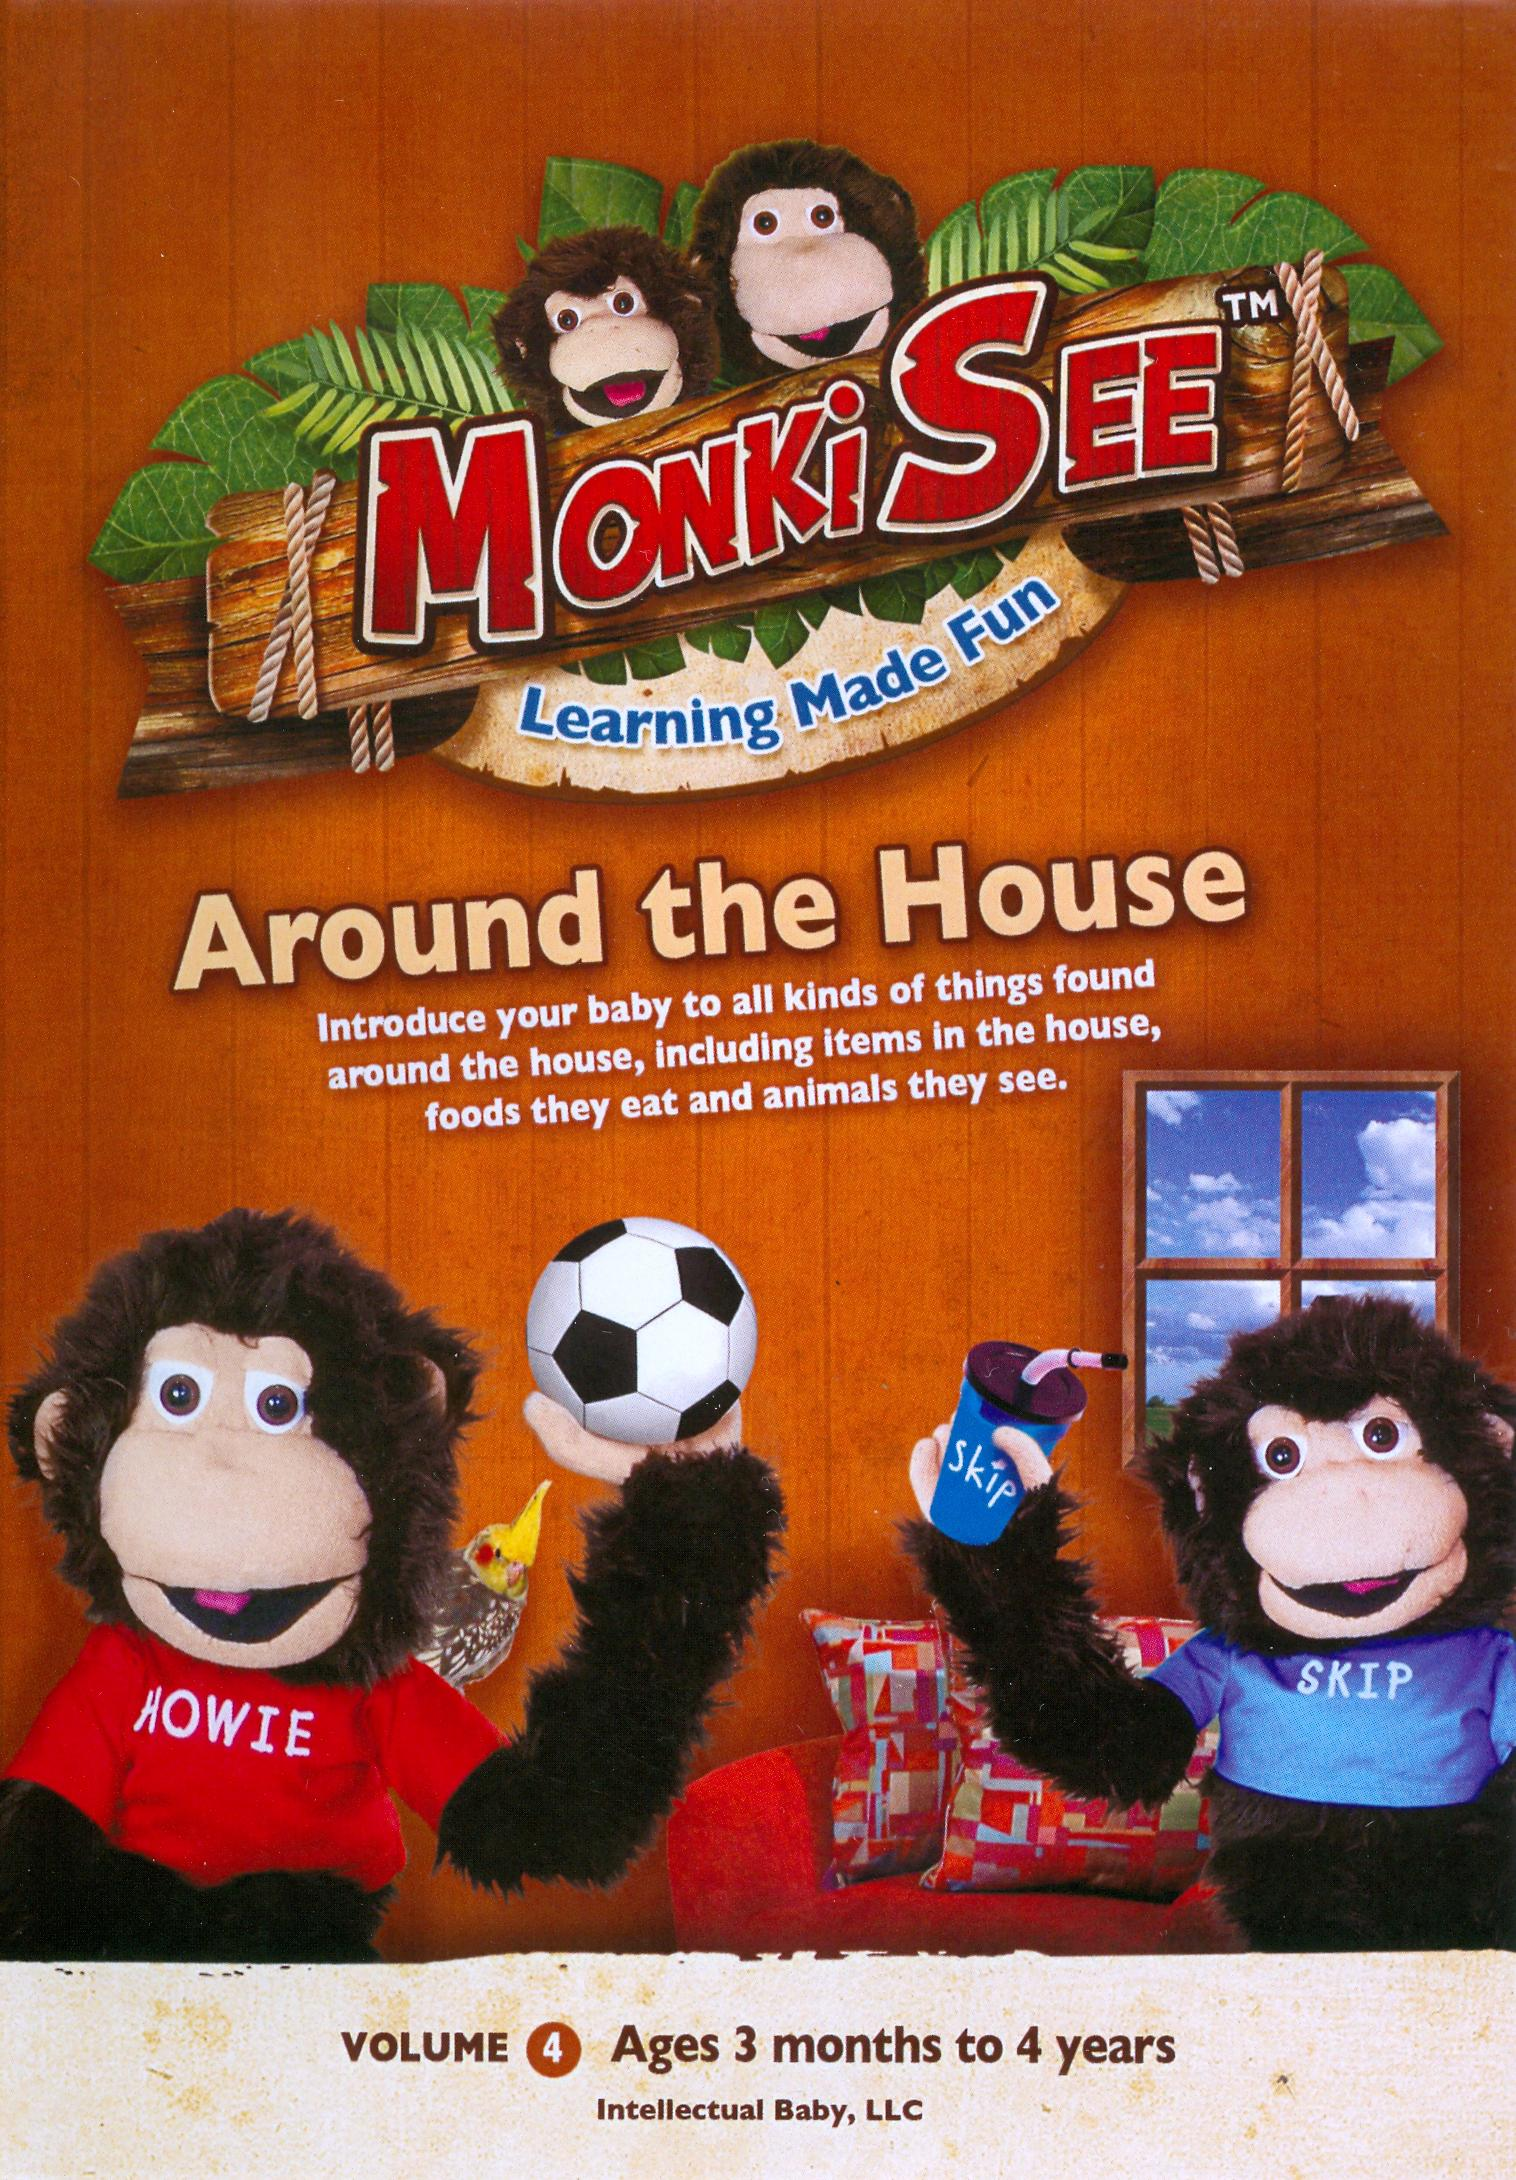 MonkiSee: Around the House